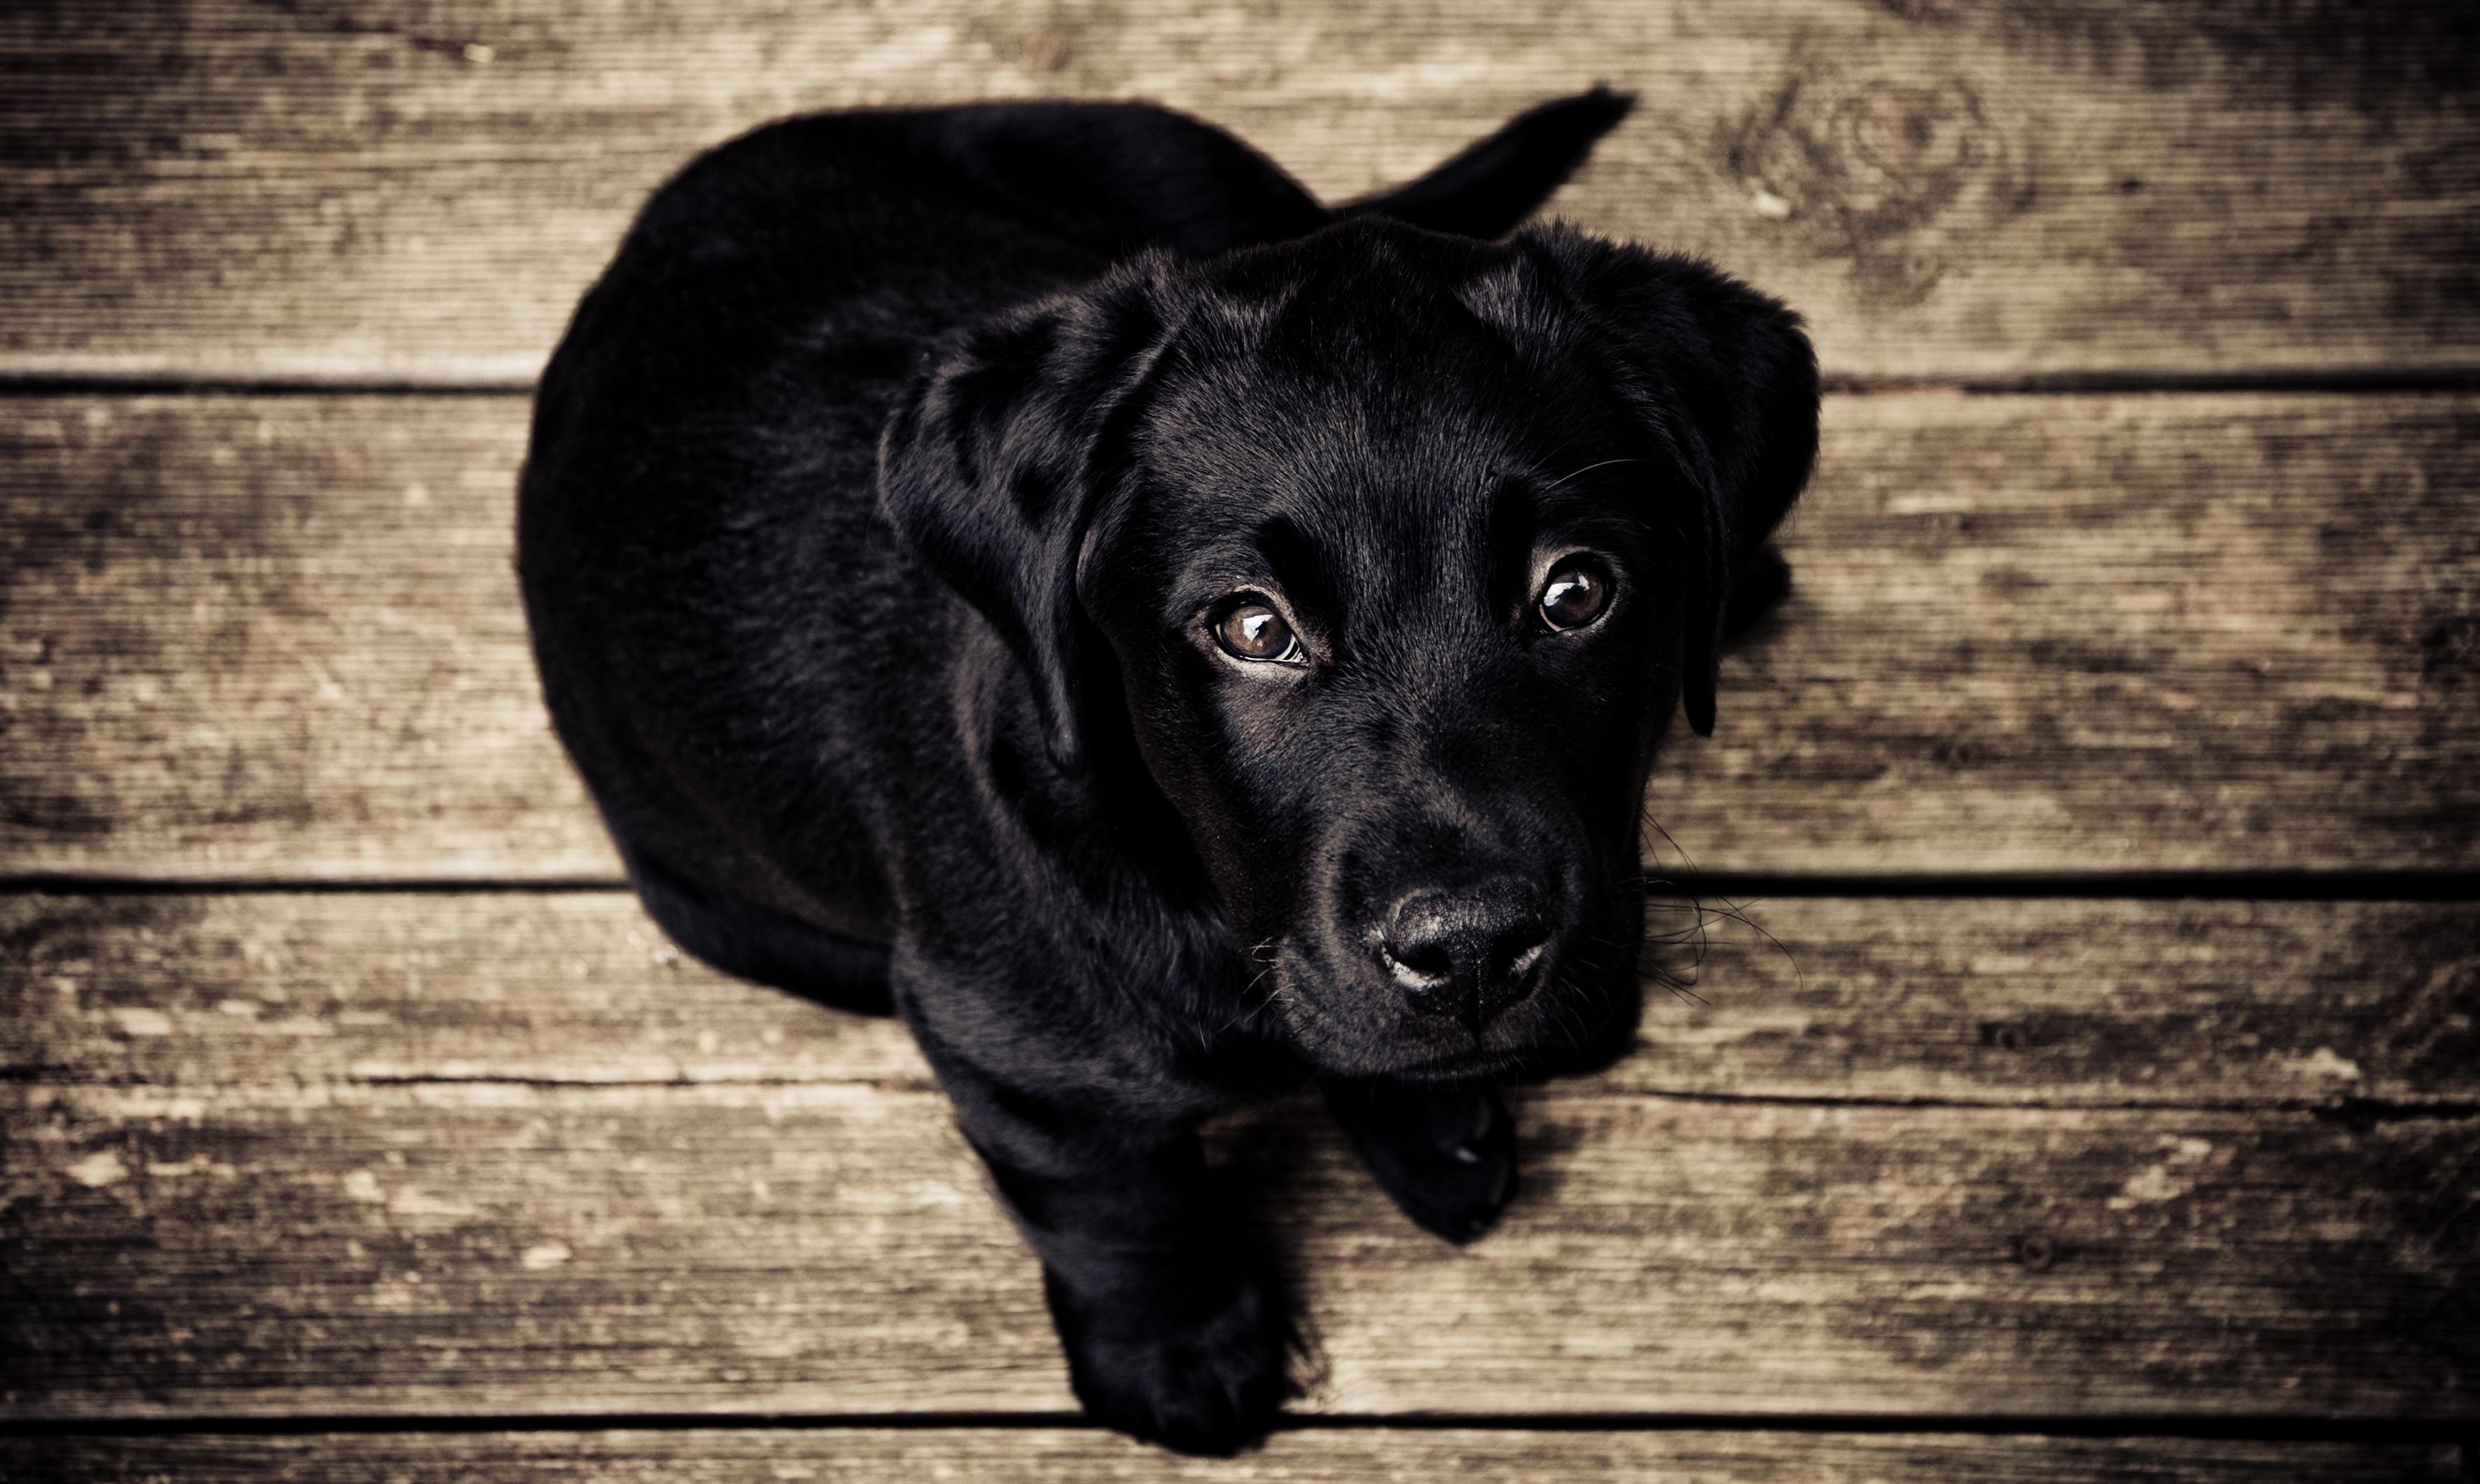 Popular Labrador Retriever Black Adorable Dog - black-and-white-puppy-dog-animal-cute-canine-mammal-black-monochrome-vertebrate-labrador-retriever-retriever-monochrome-photography-dog-like-mammal-162  Pic_33913  .jpg